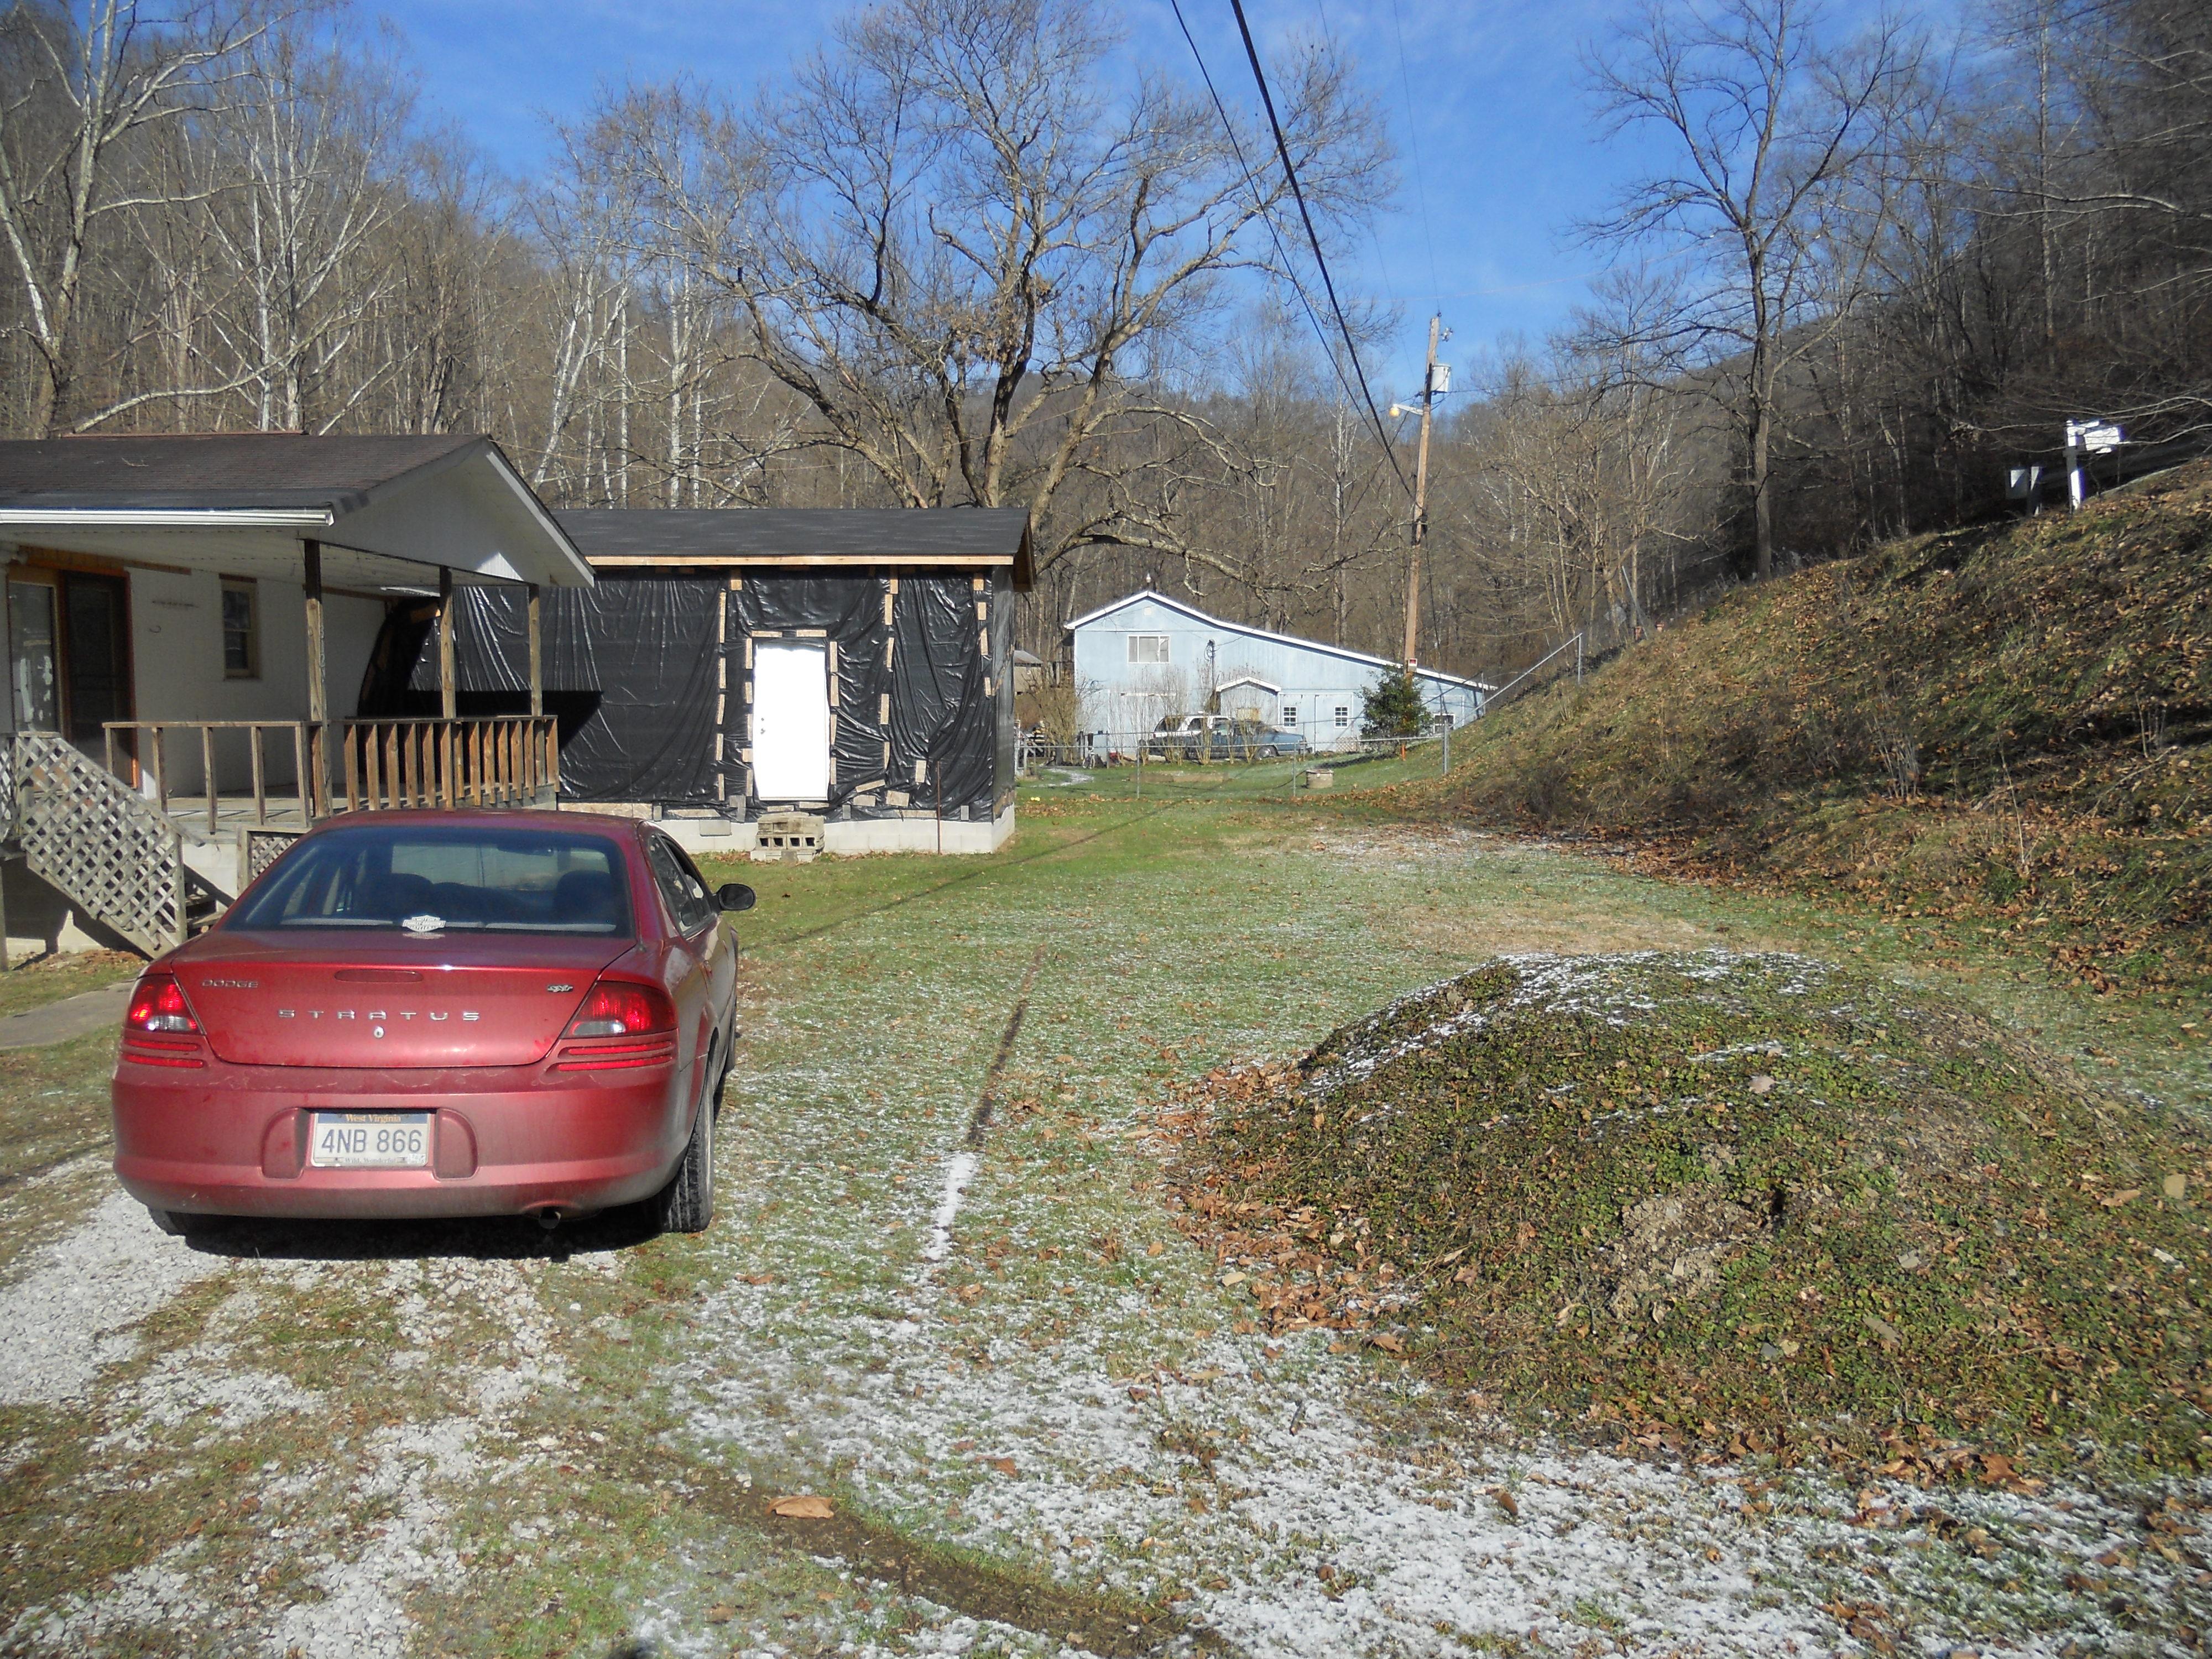 3129 Main Smokehouse Rd., Harts, West Virginia 25524